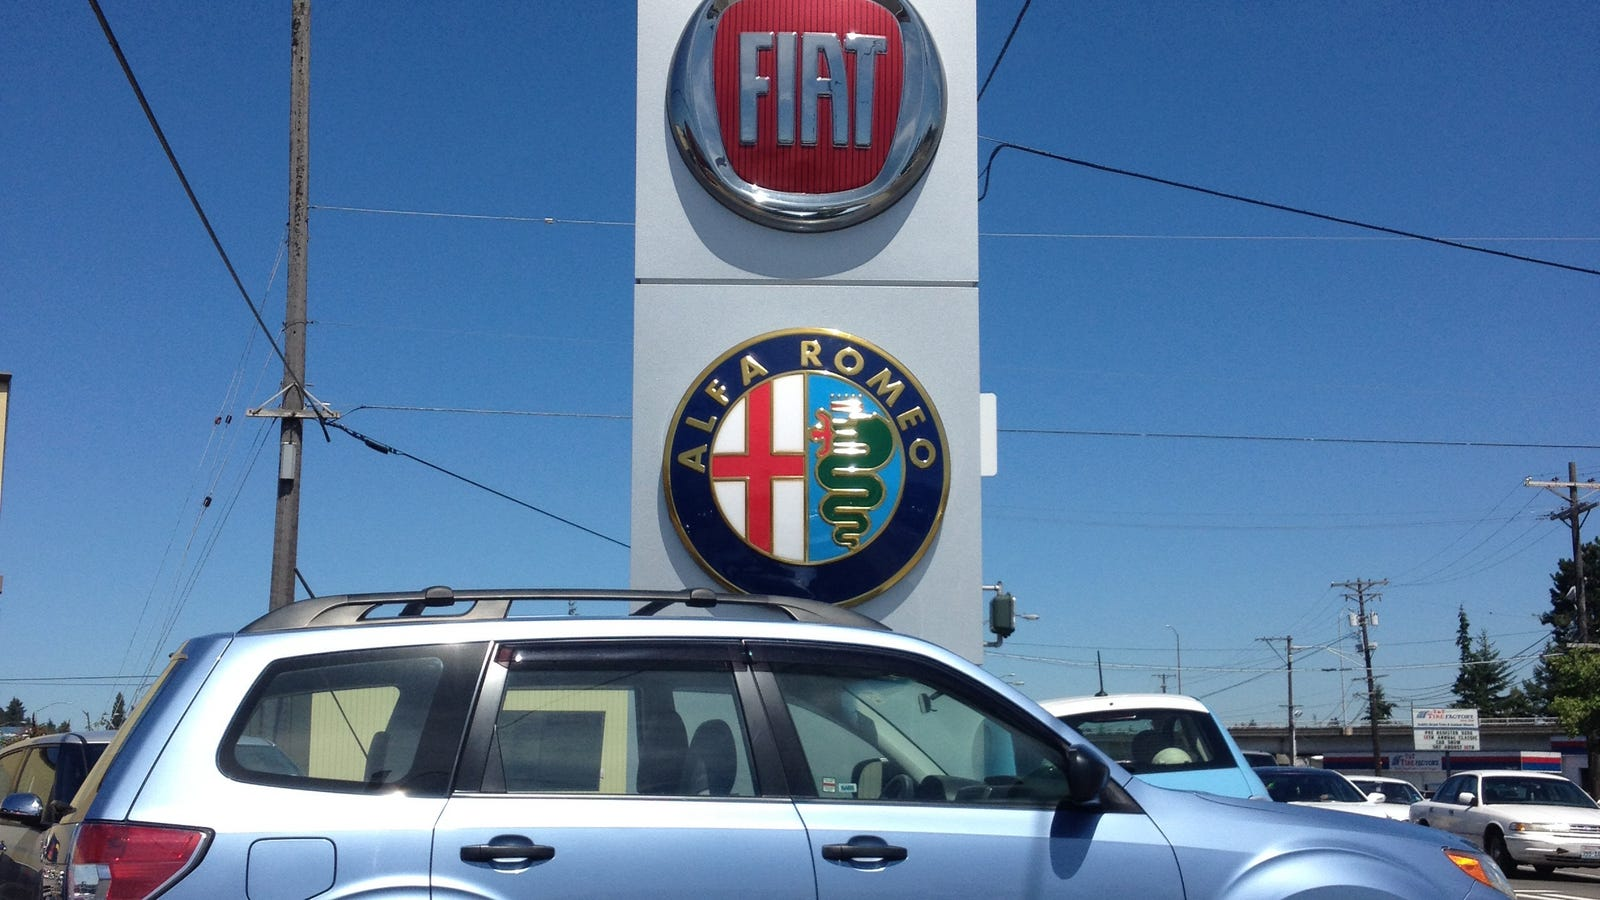 Fiat alfa romeo kirkland